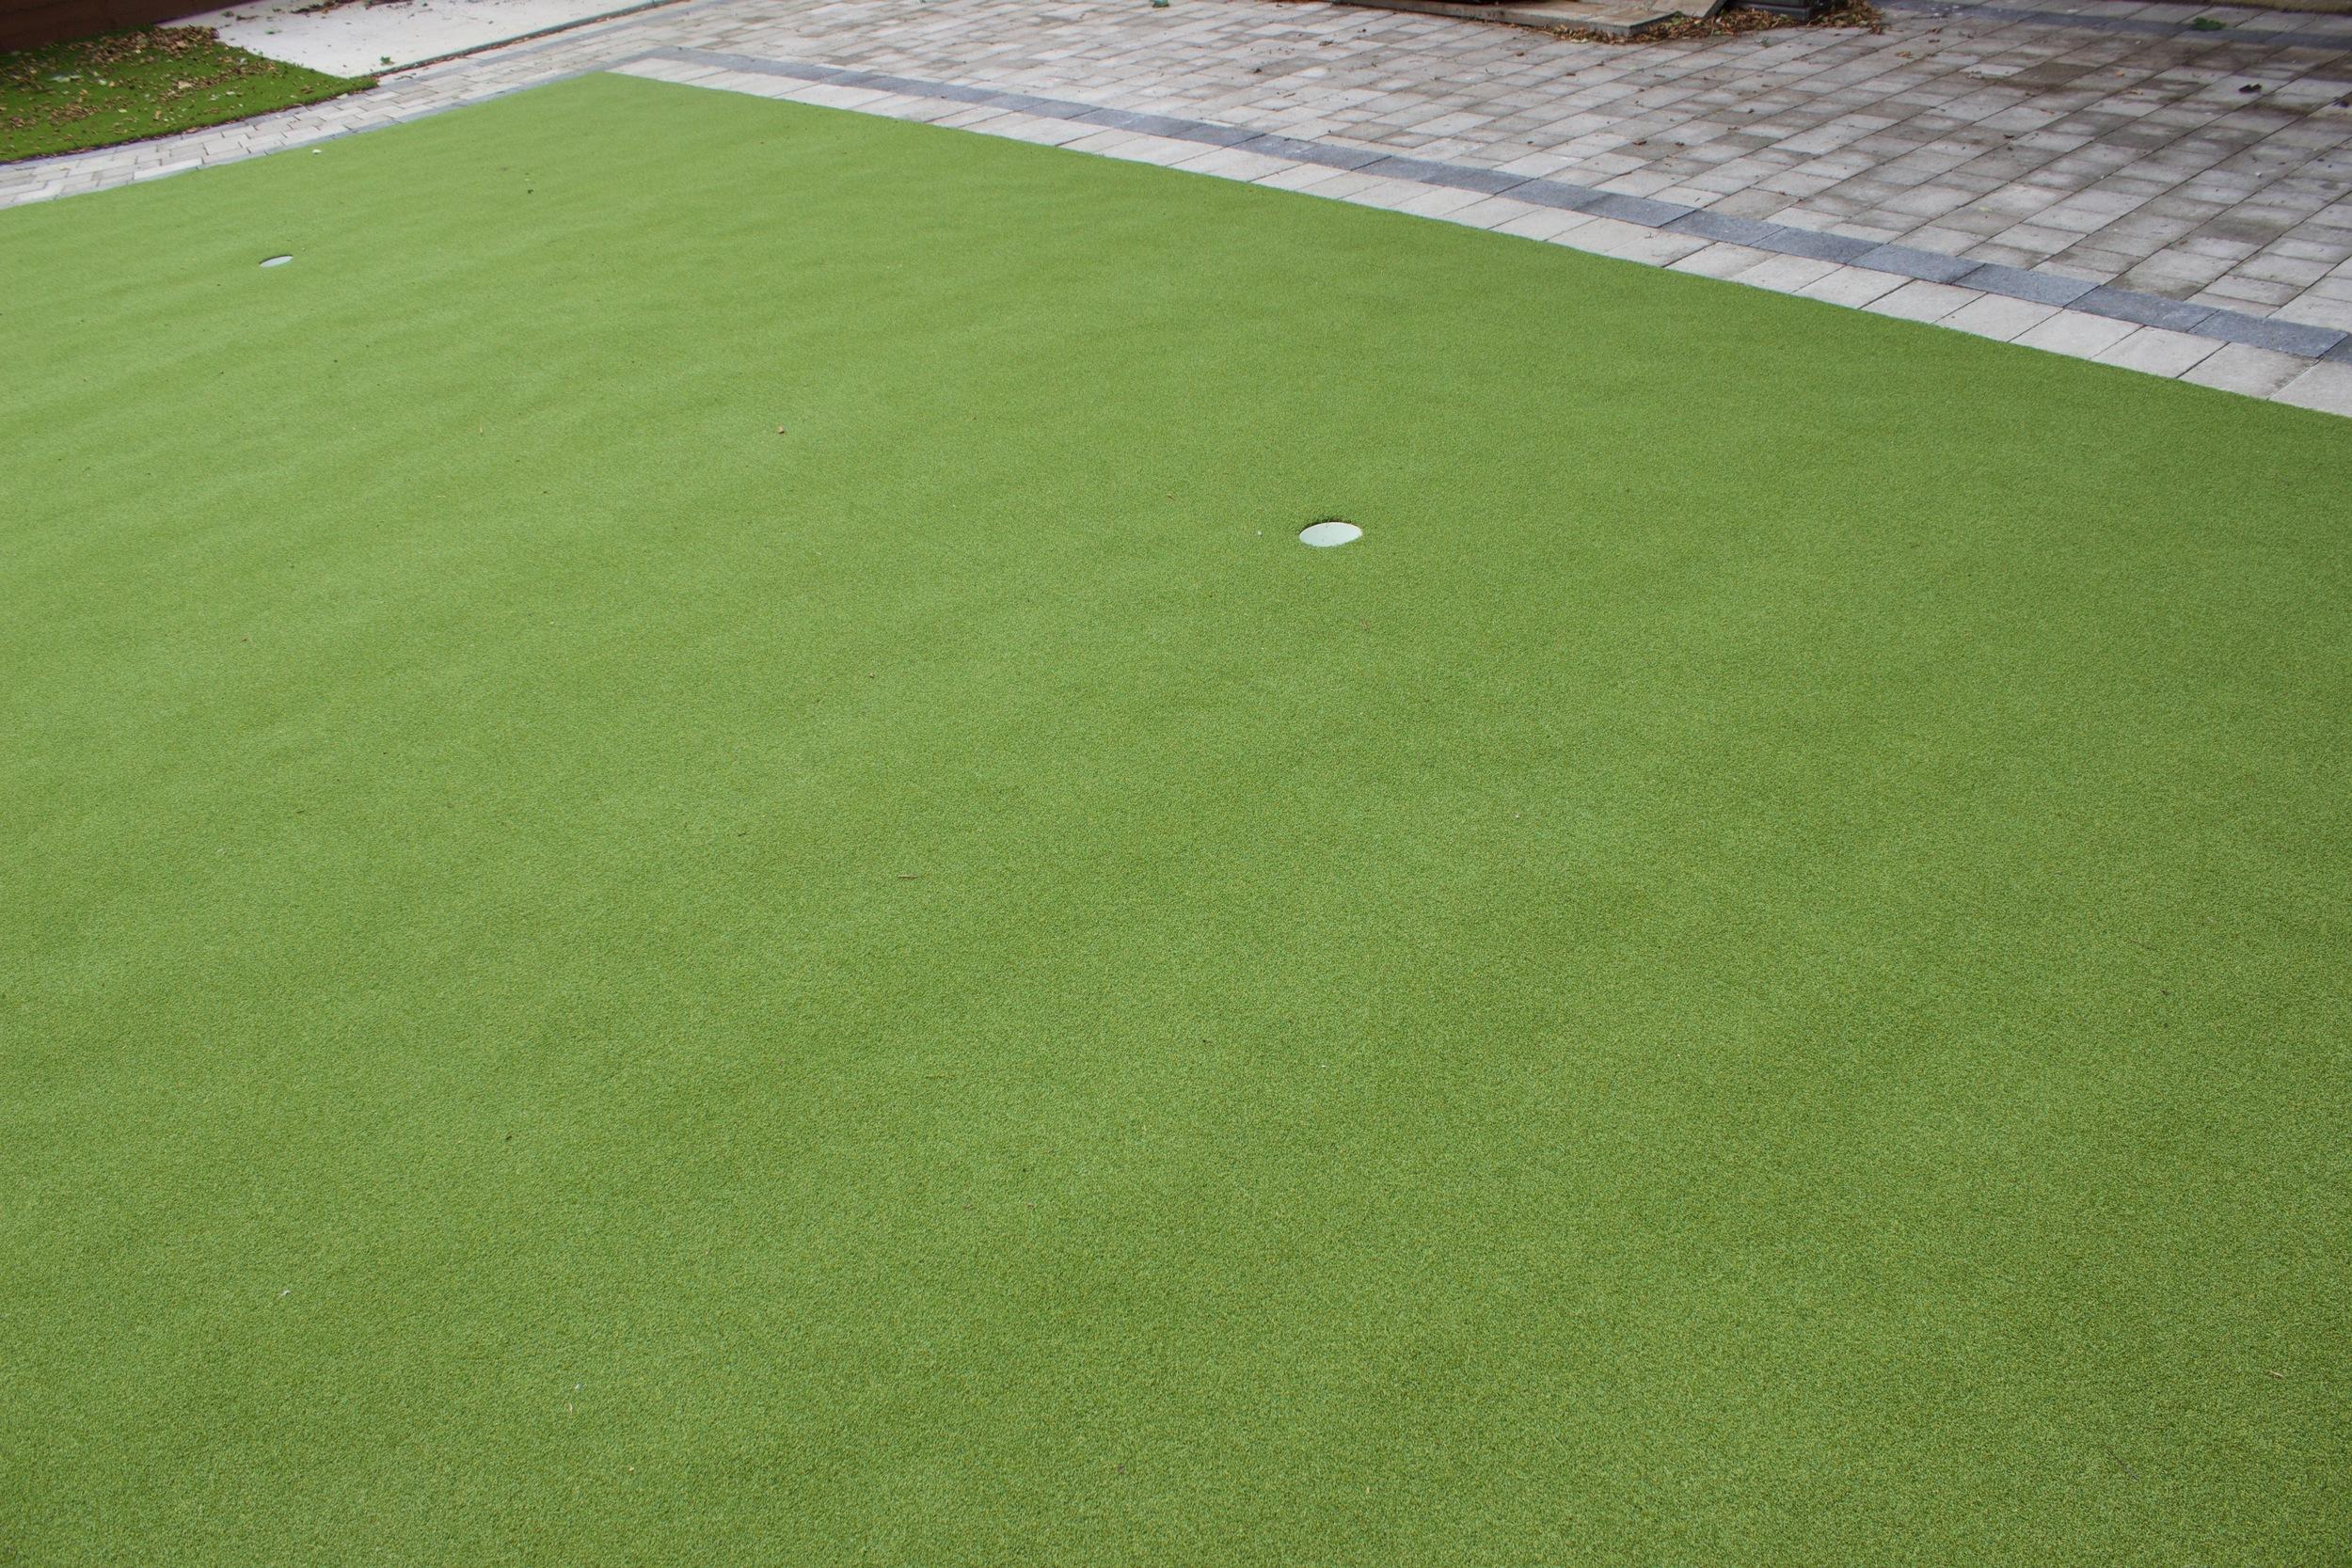 Pro Golf Green